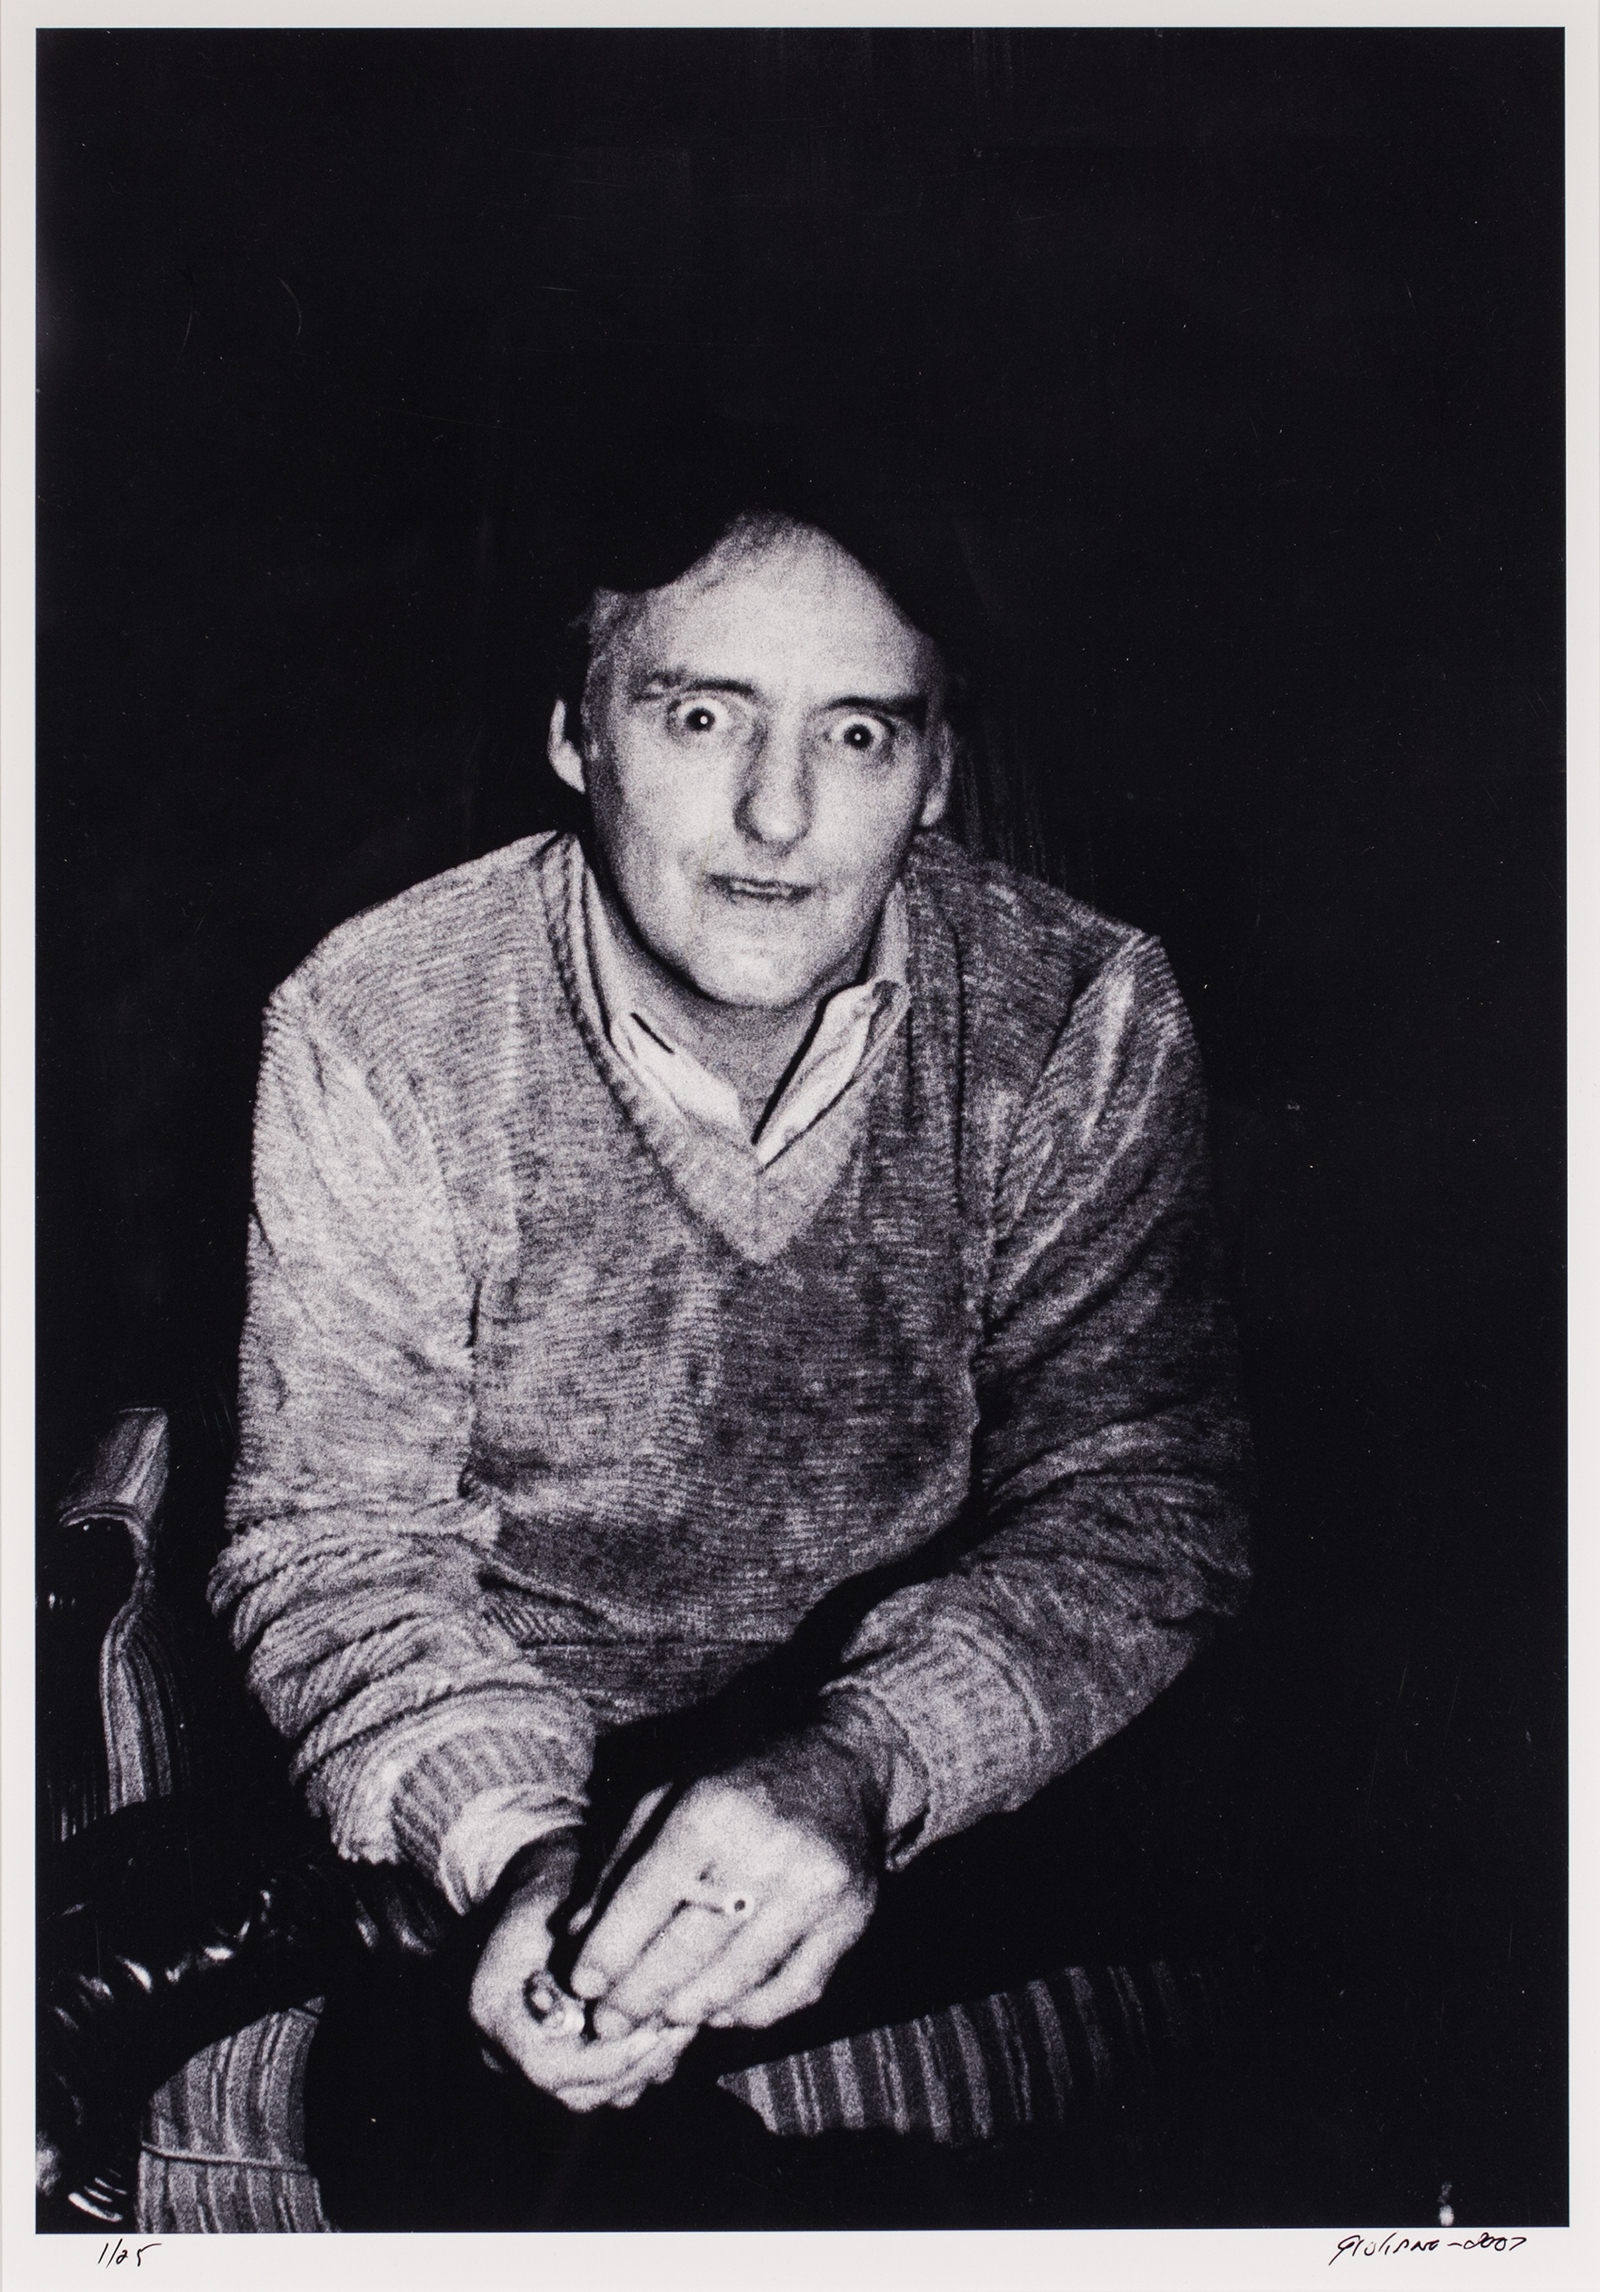 Charles Giuliano, Dennis Hopper, printed 2007